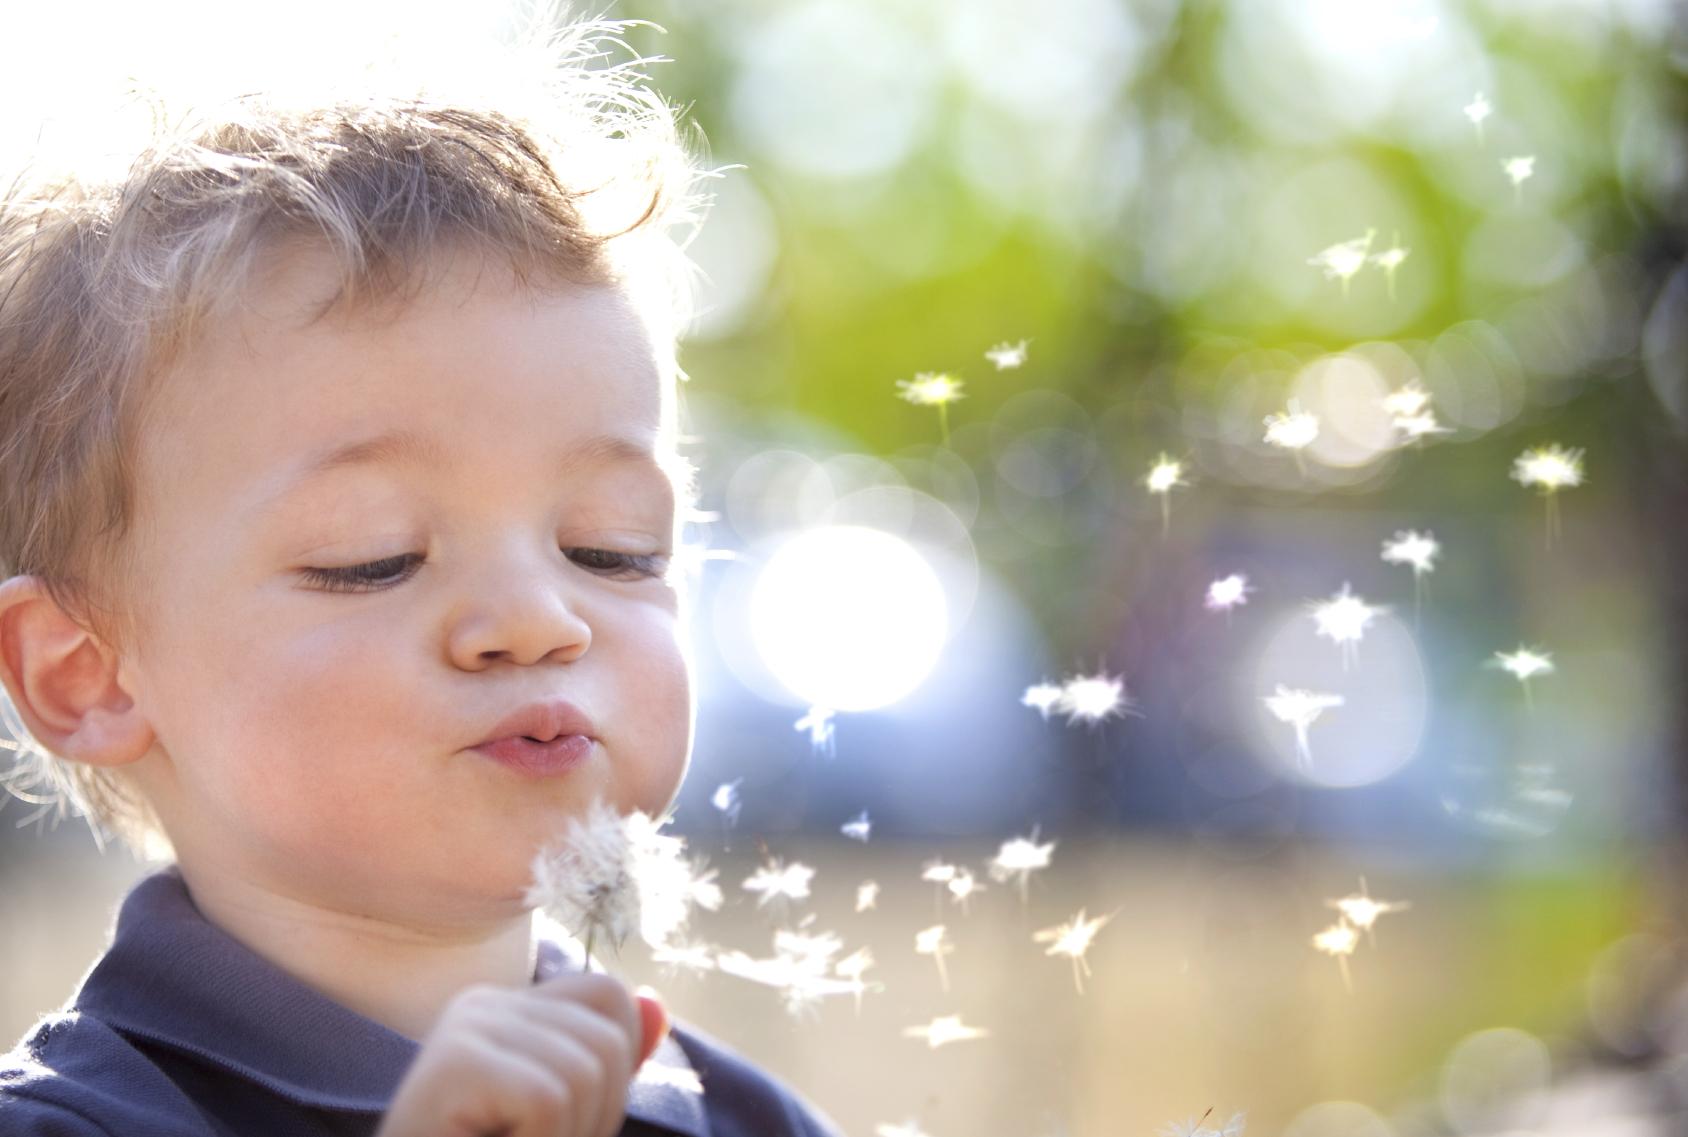 beautiful blond kid blow dandelion outdoor